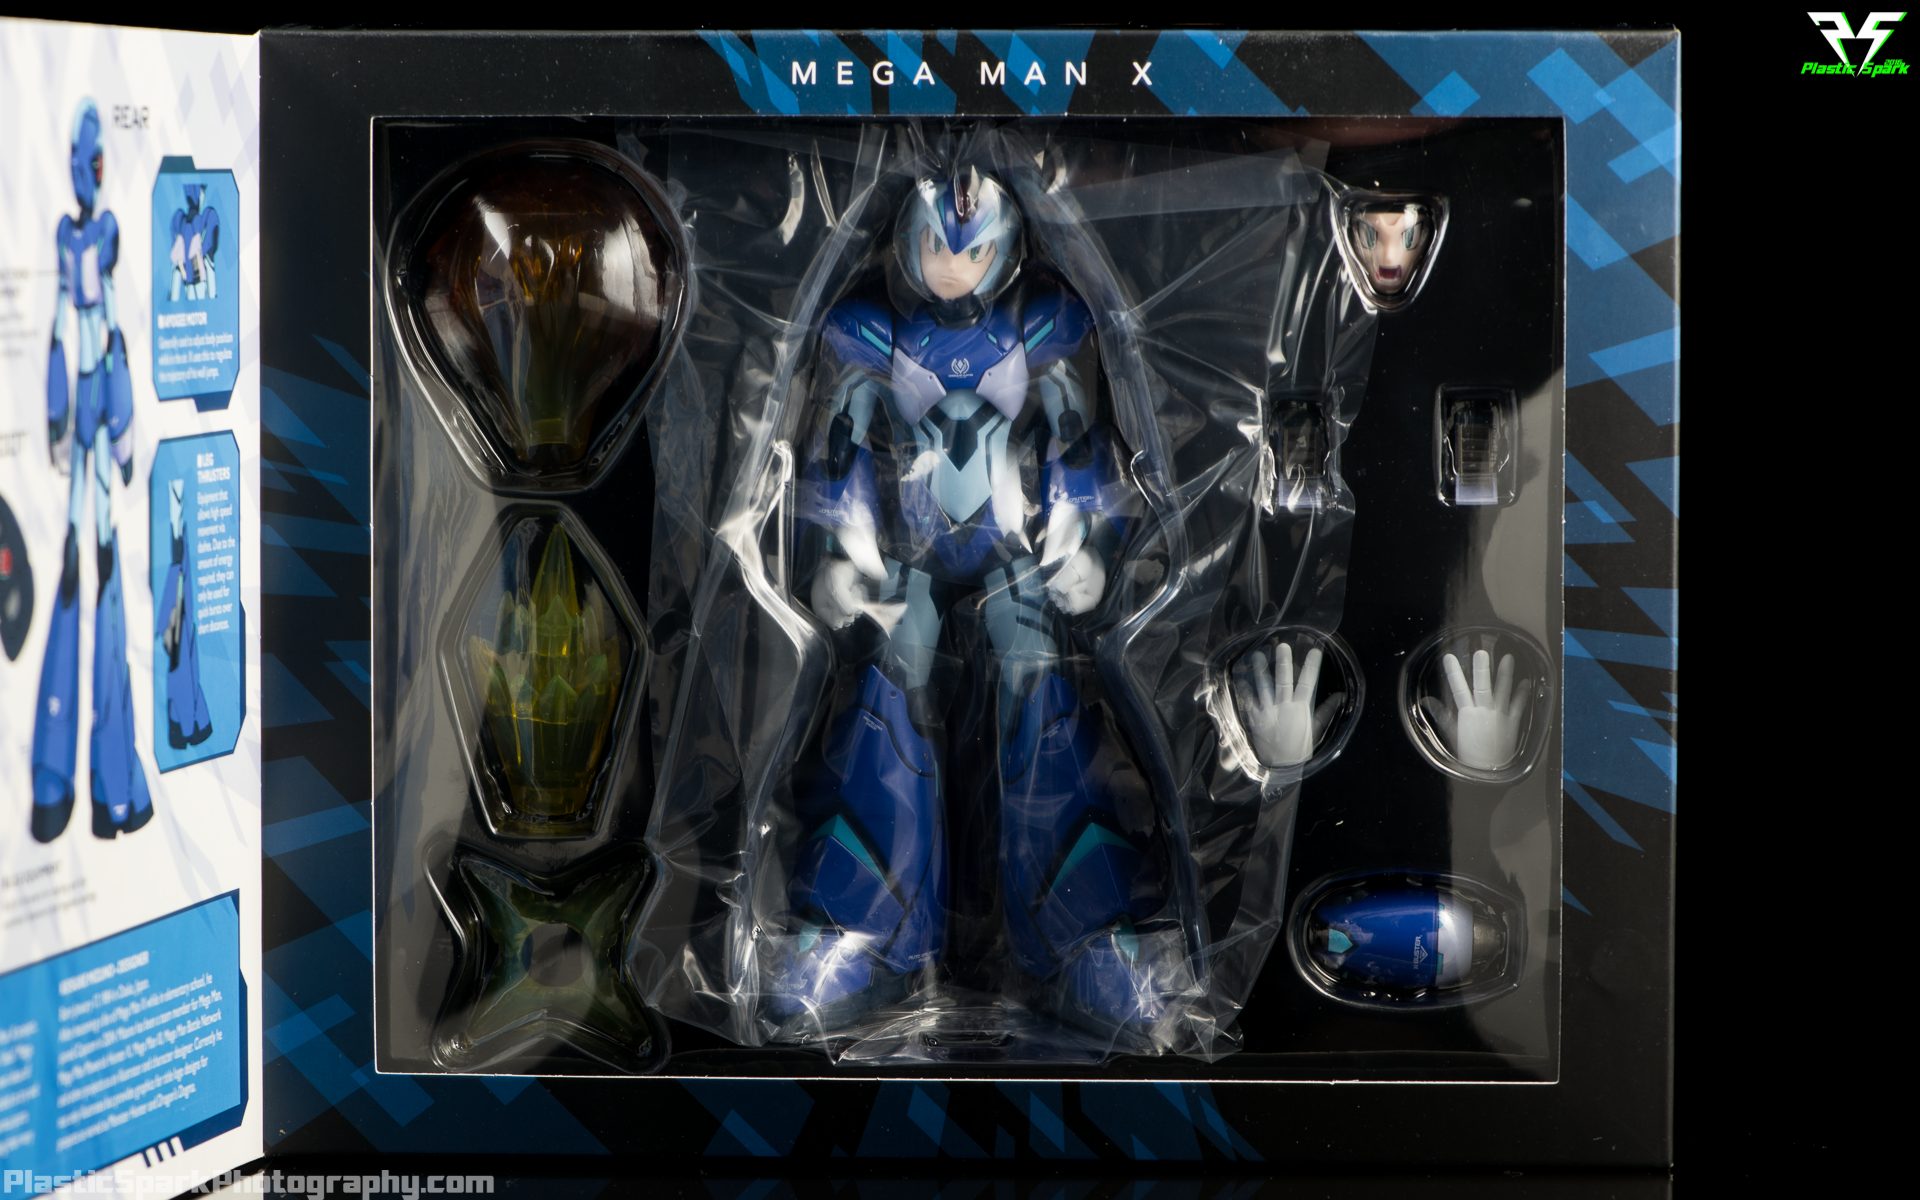 Truforce-Megaman-X-Packaging-(6-of-6).png